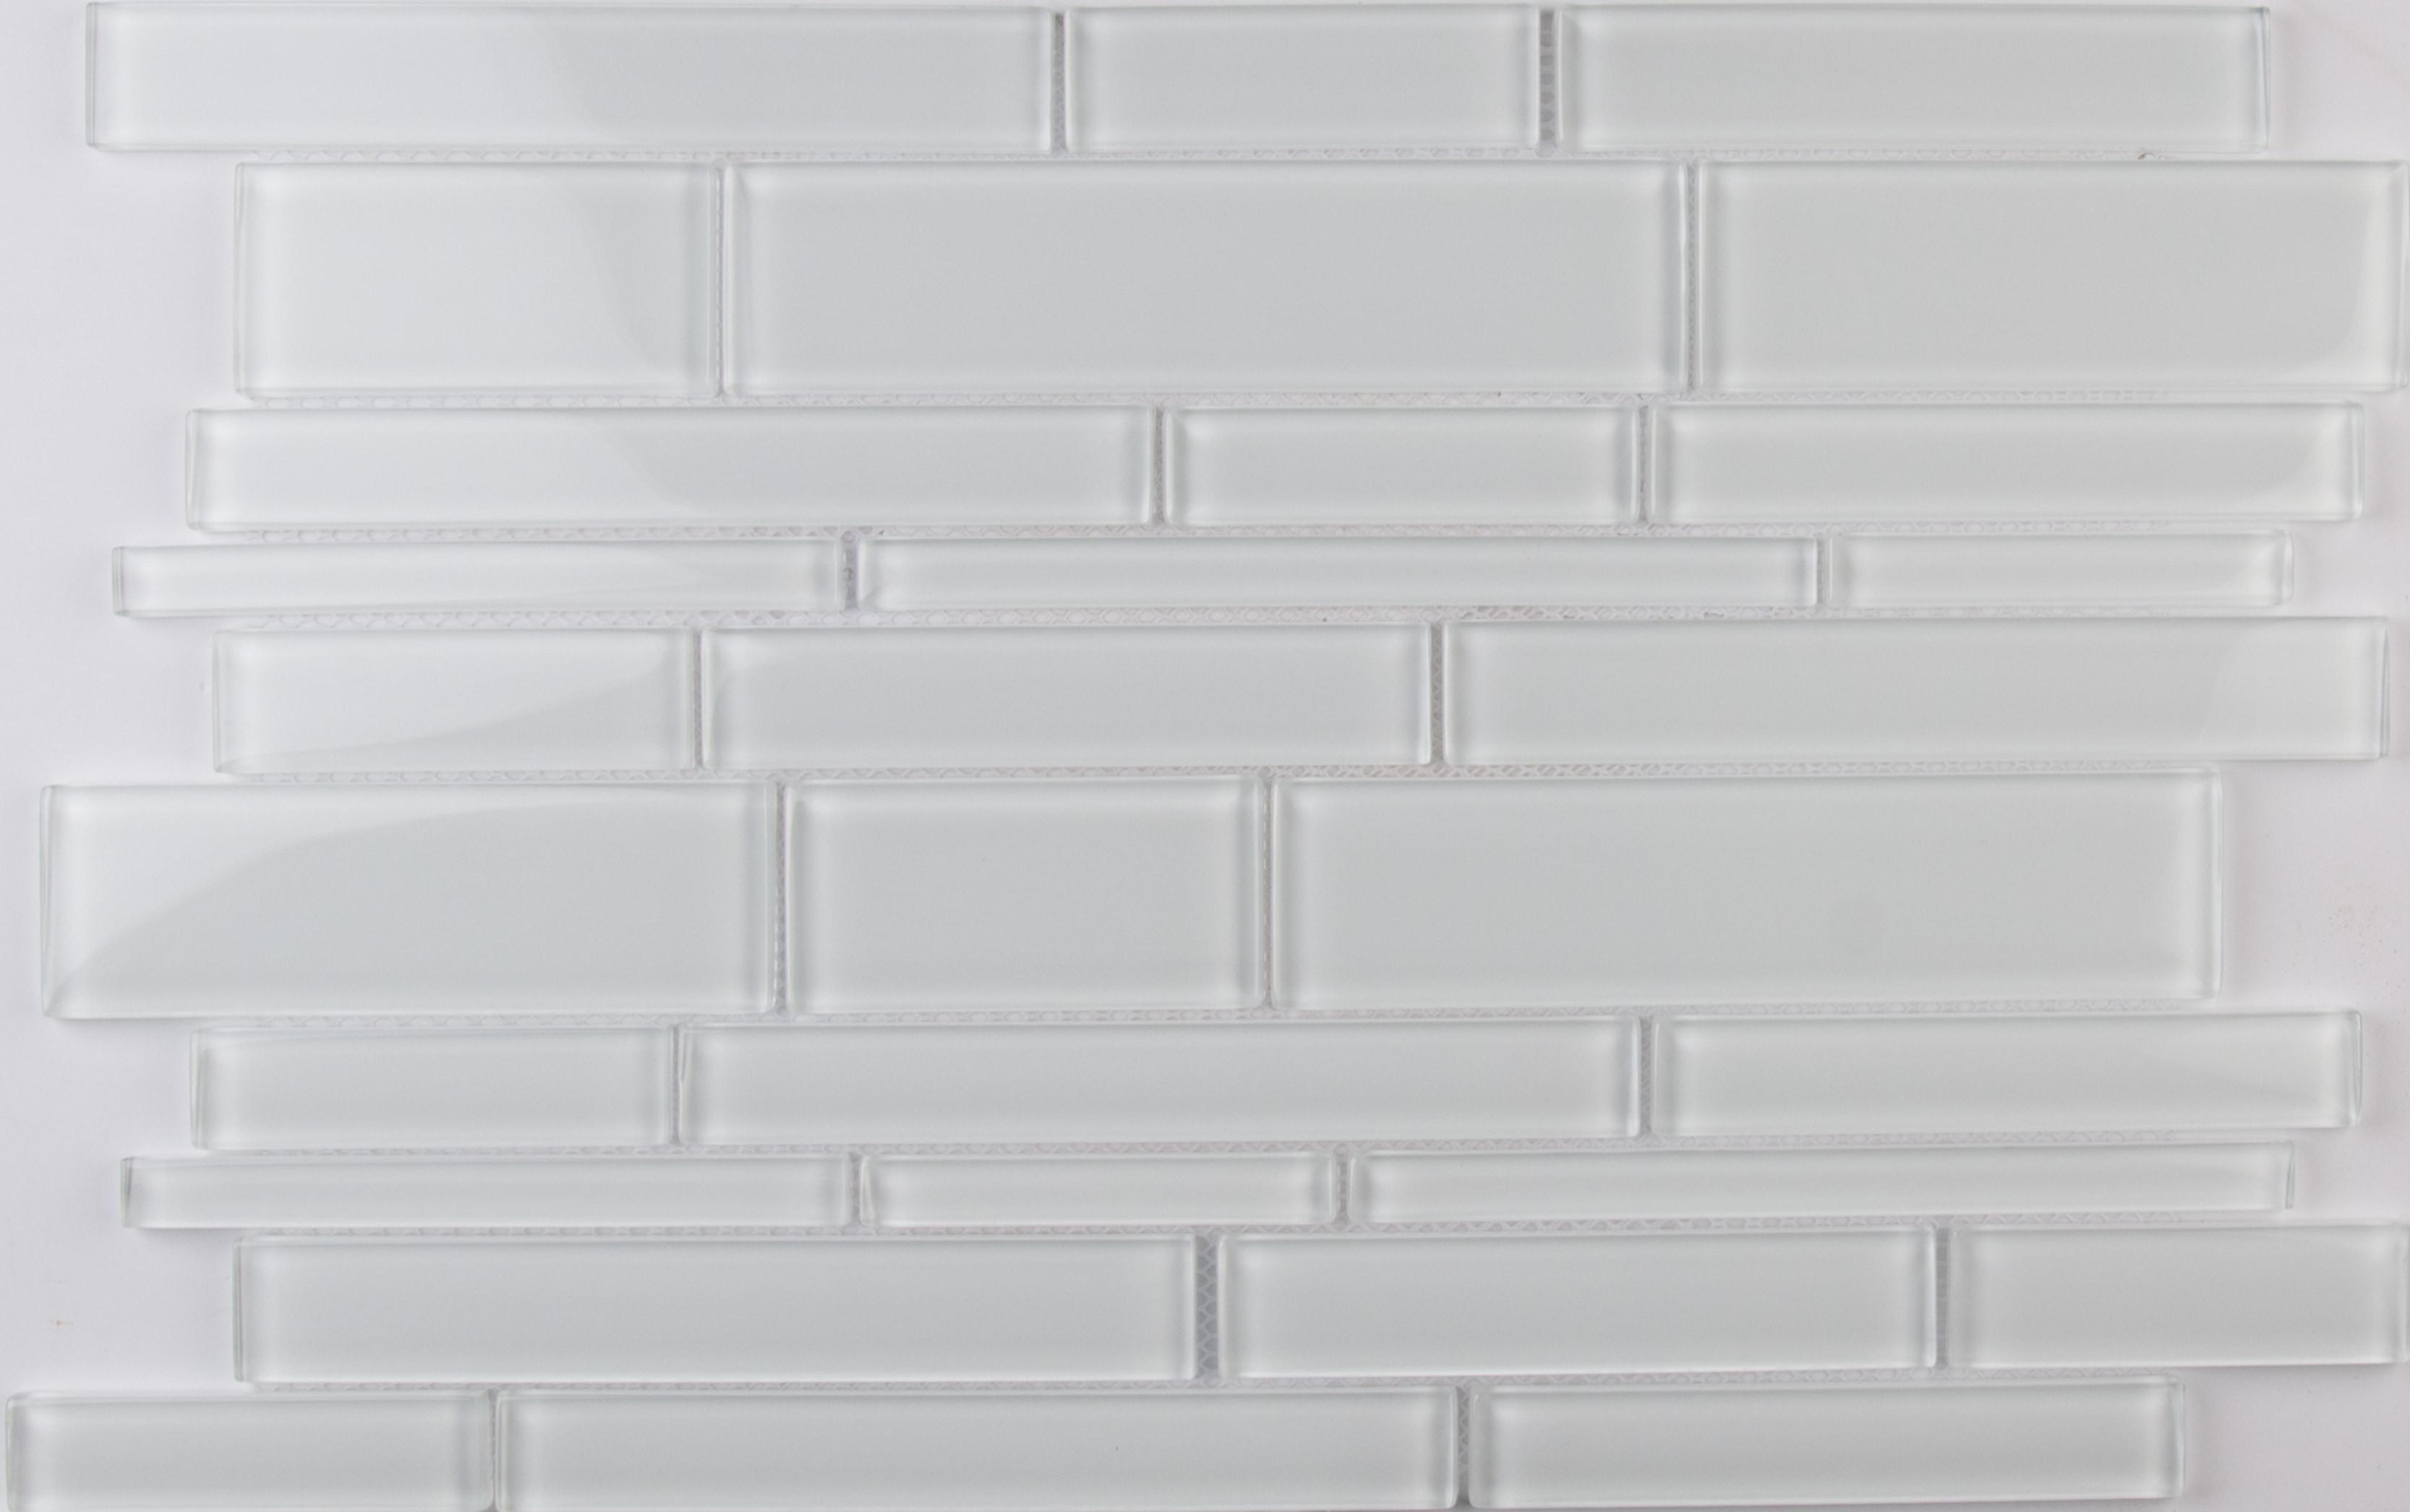 Ice Interlocking 8mm / Pattern / Glossy Glass Mosaic - Ice Collection 0